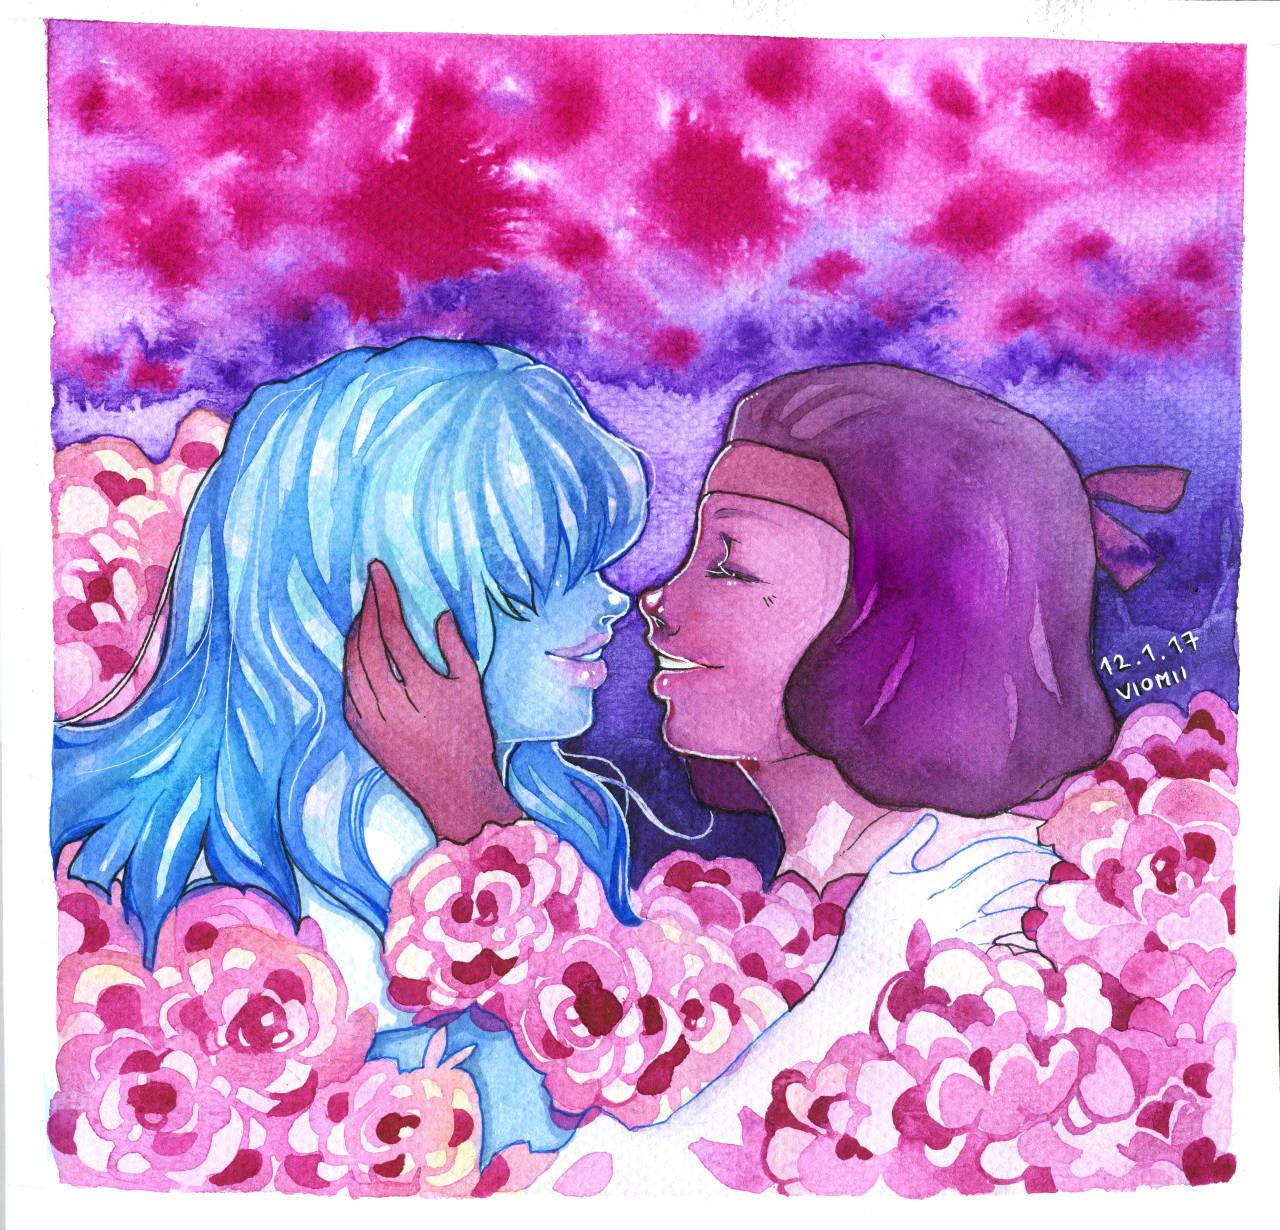 Lovers in the flowerfield. (Pose 2B)